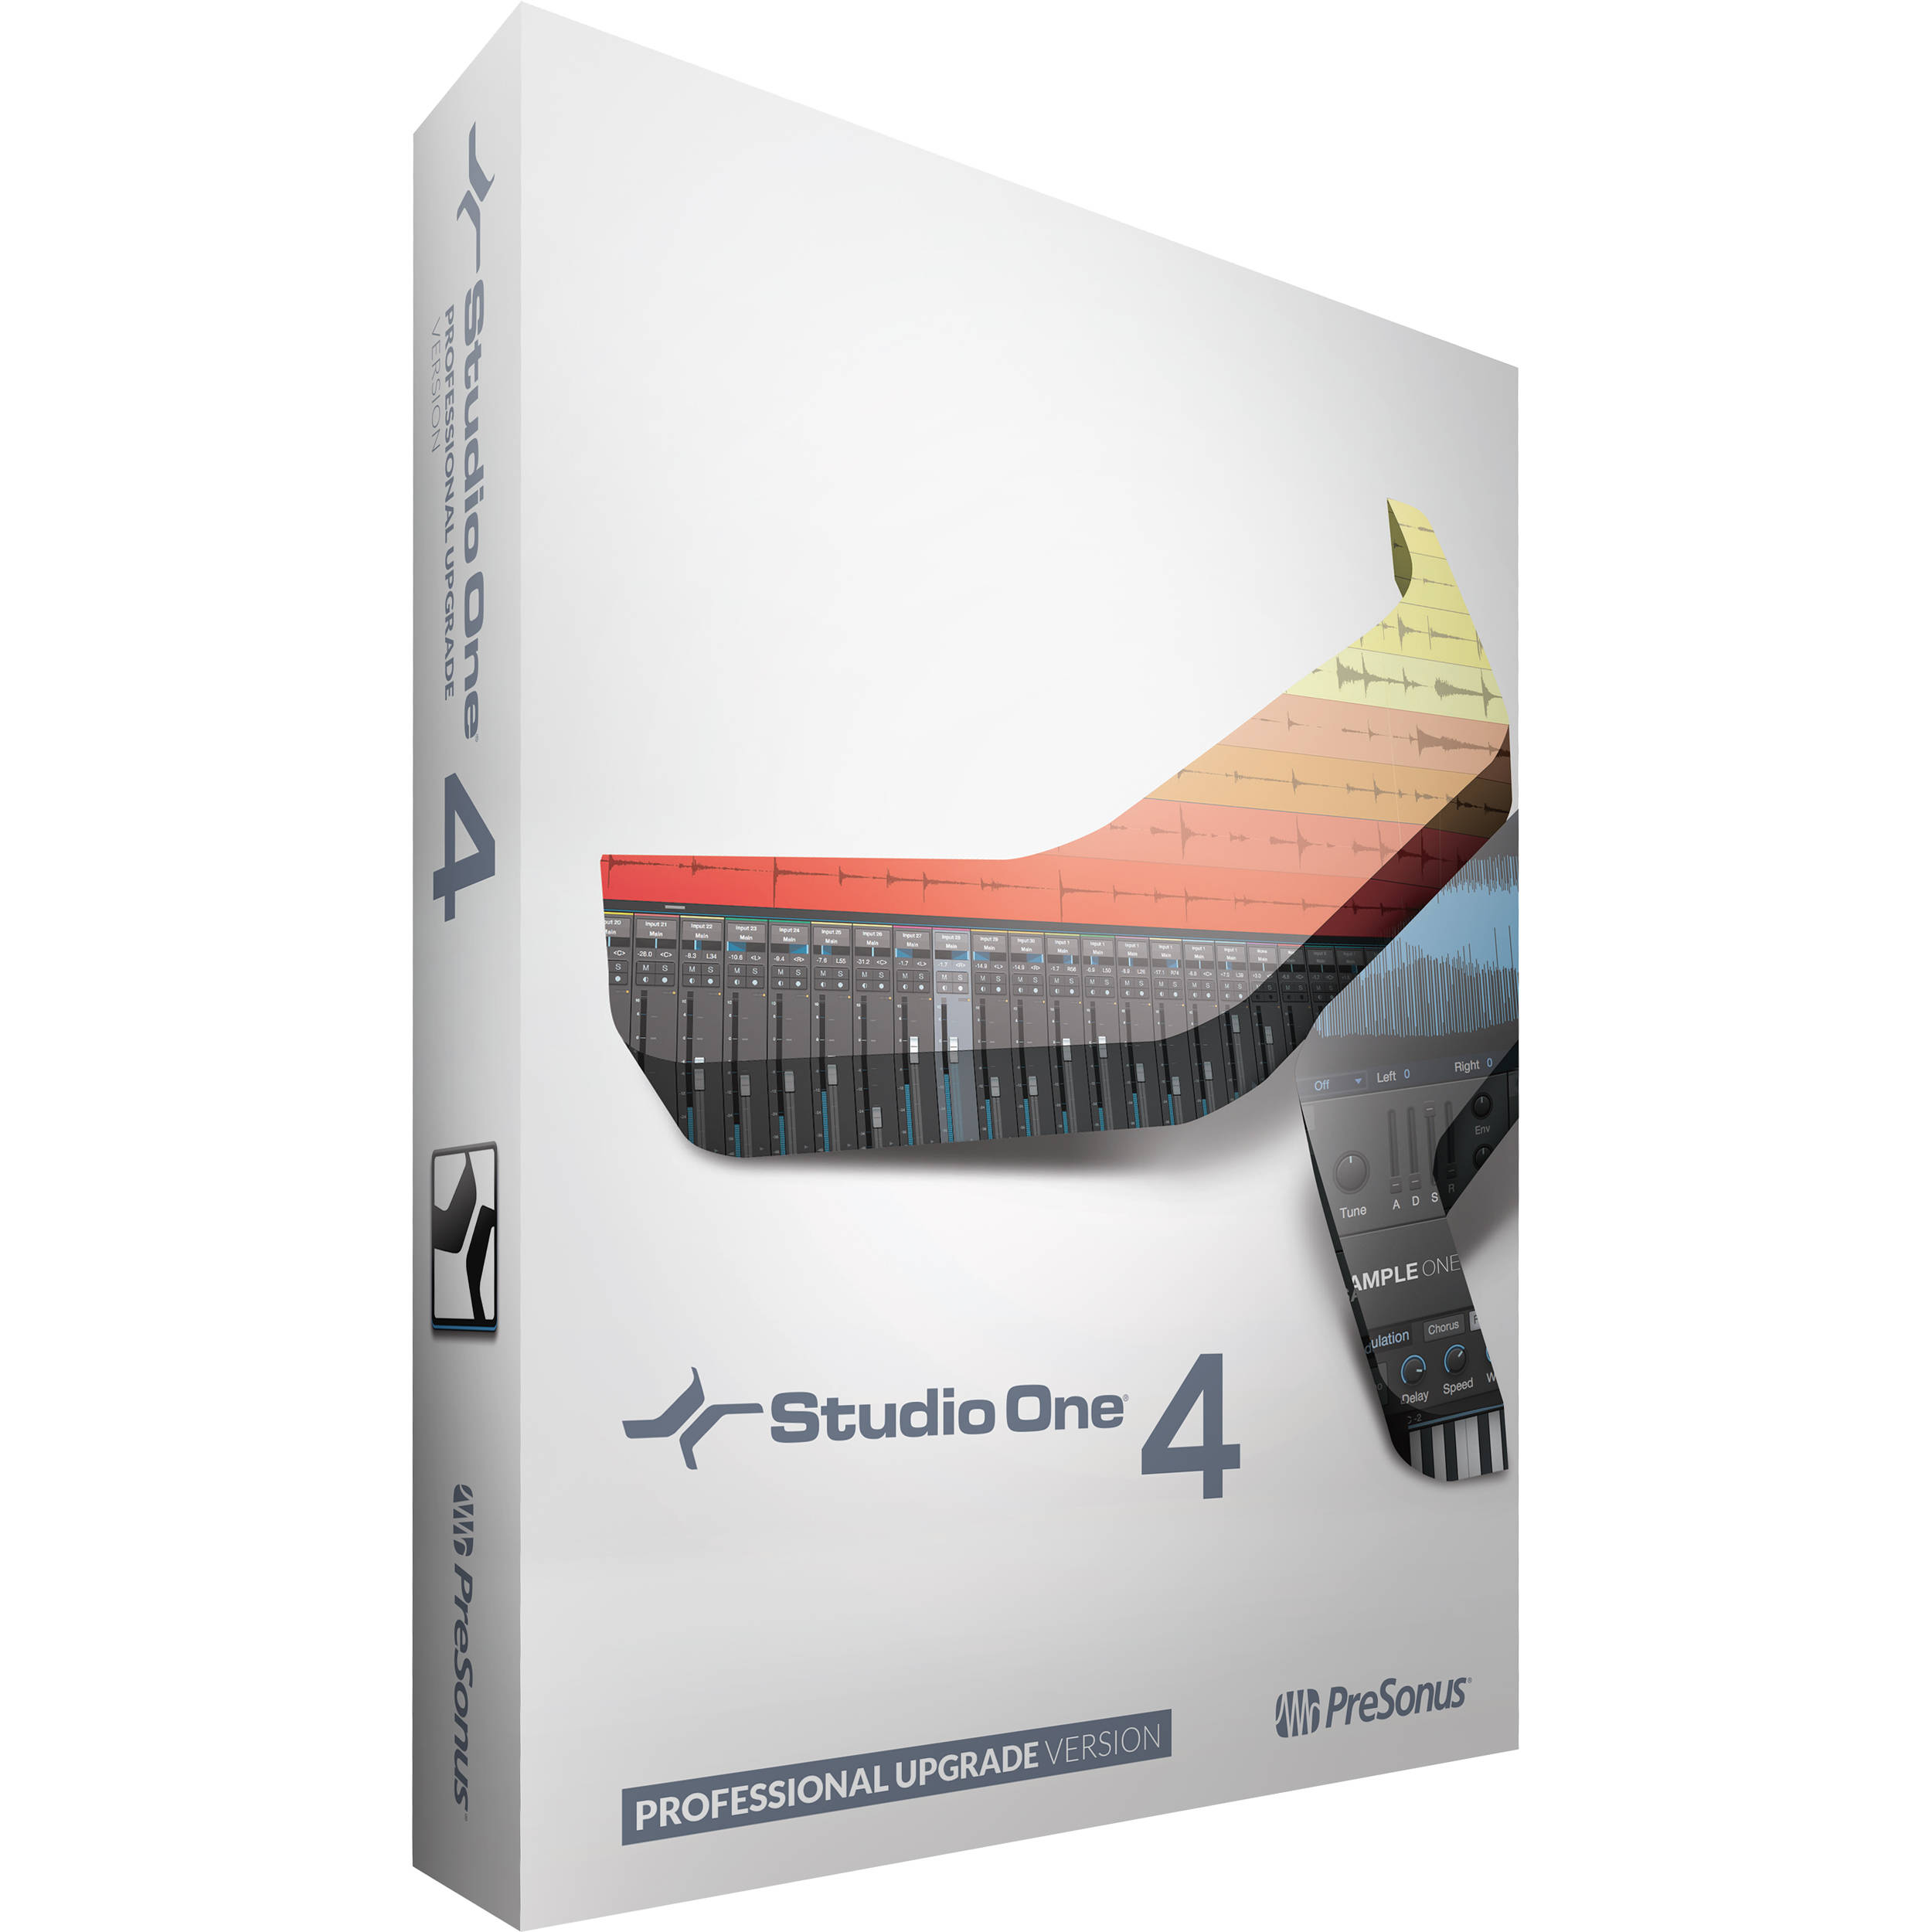 Presonus Studio One 4 Pro Upgrade from Artist//Producer+AKG Mic+ShockMount+Case